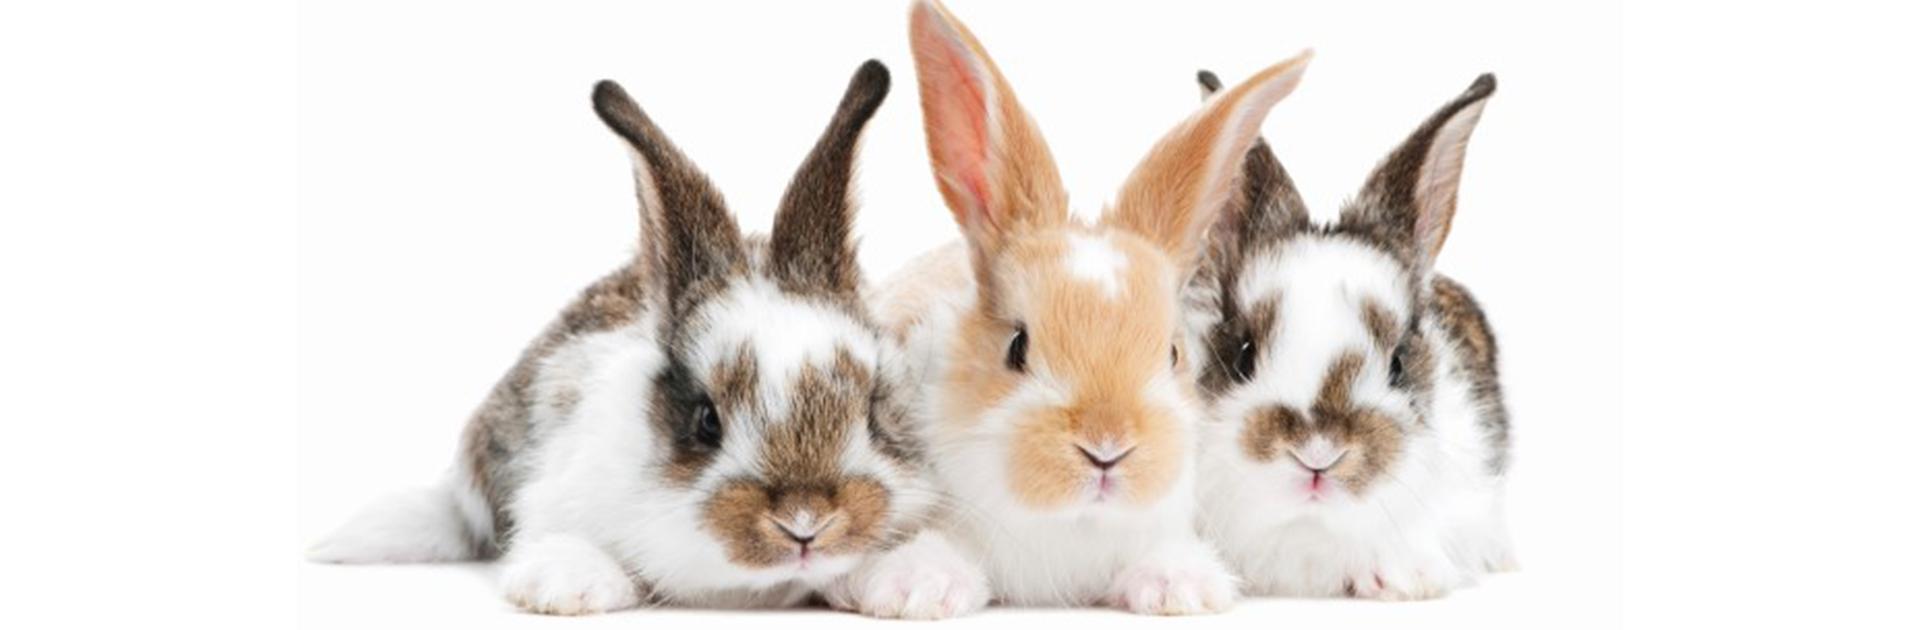 Rabbit awareness week banner